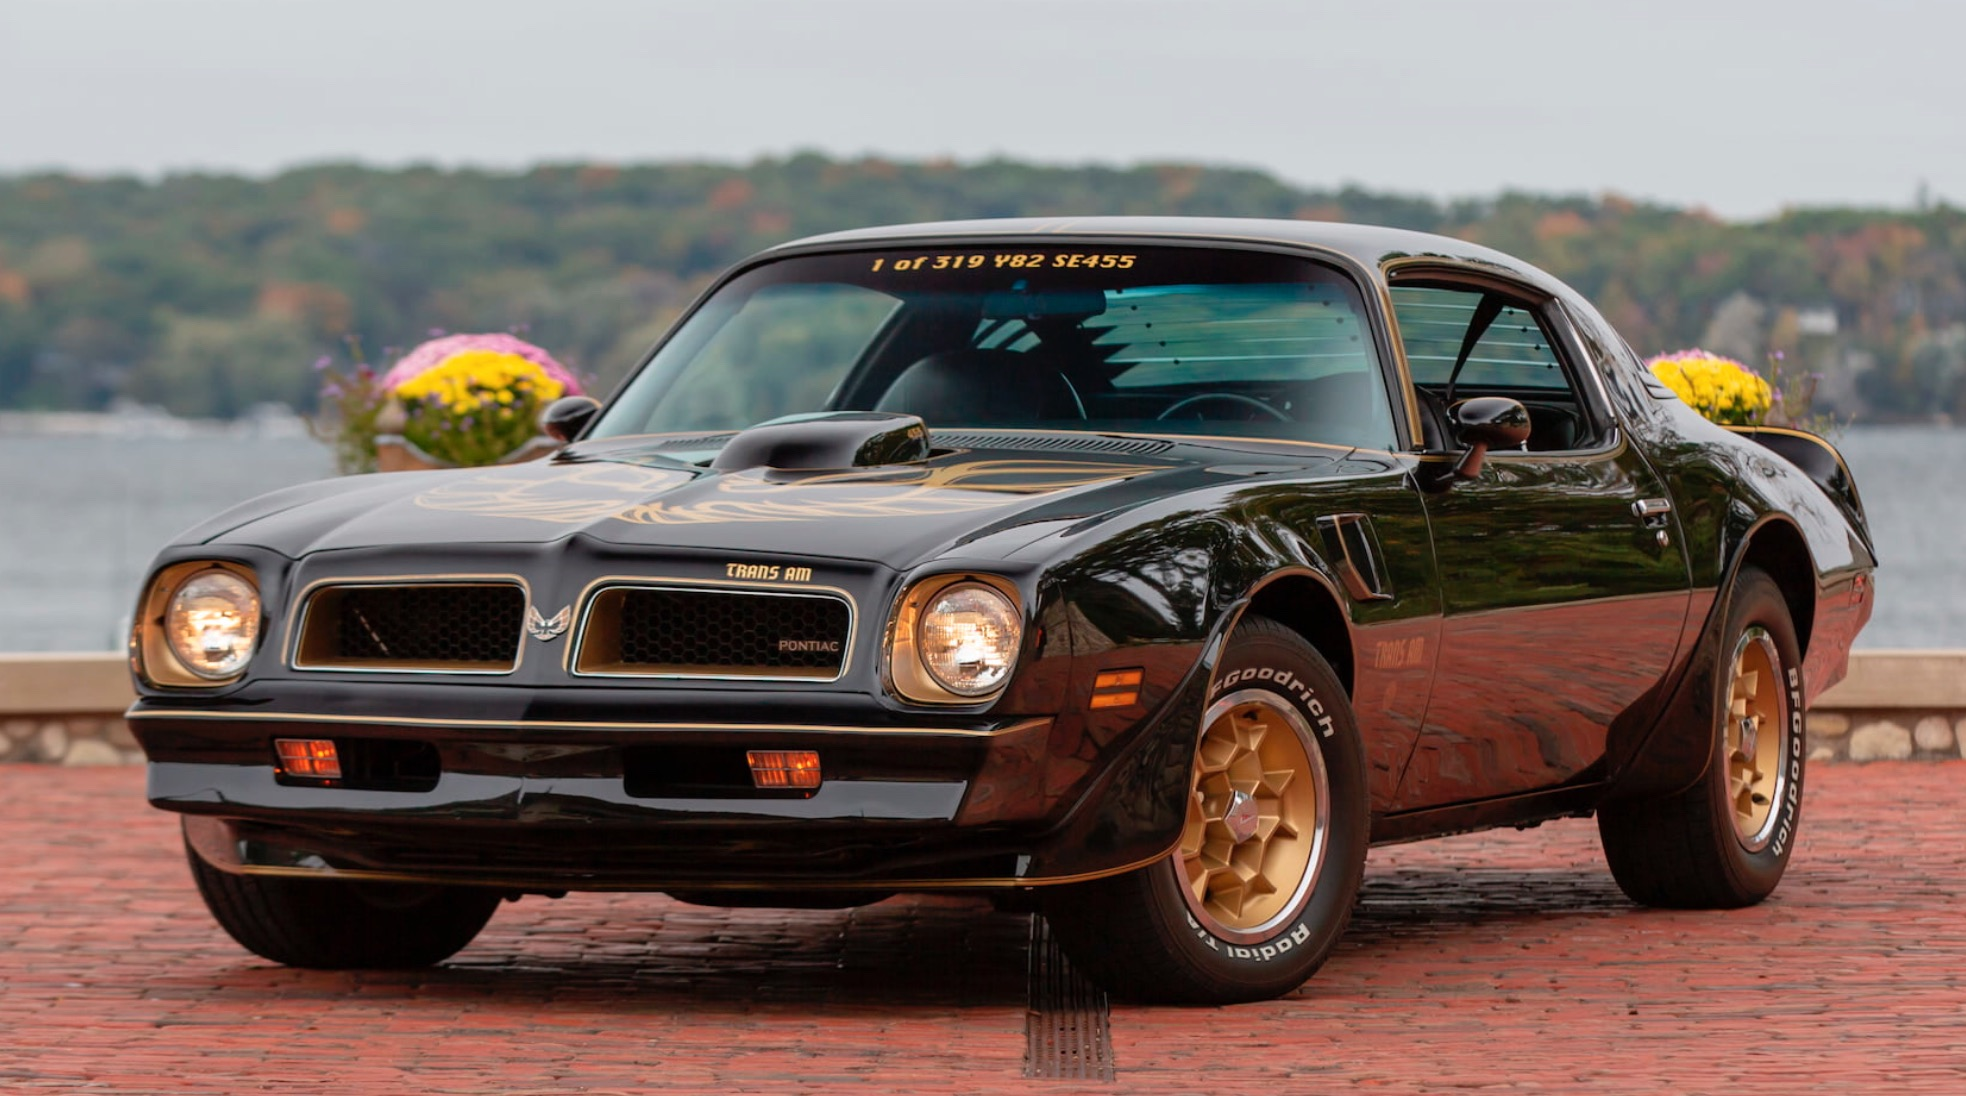 1976 Pontiac Firebird Trans Am 50th Anniversary